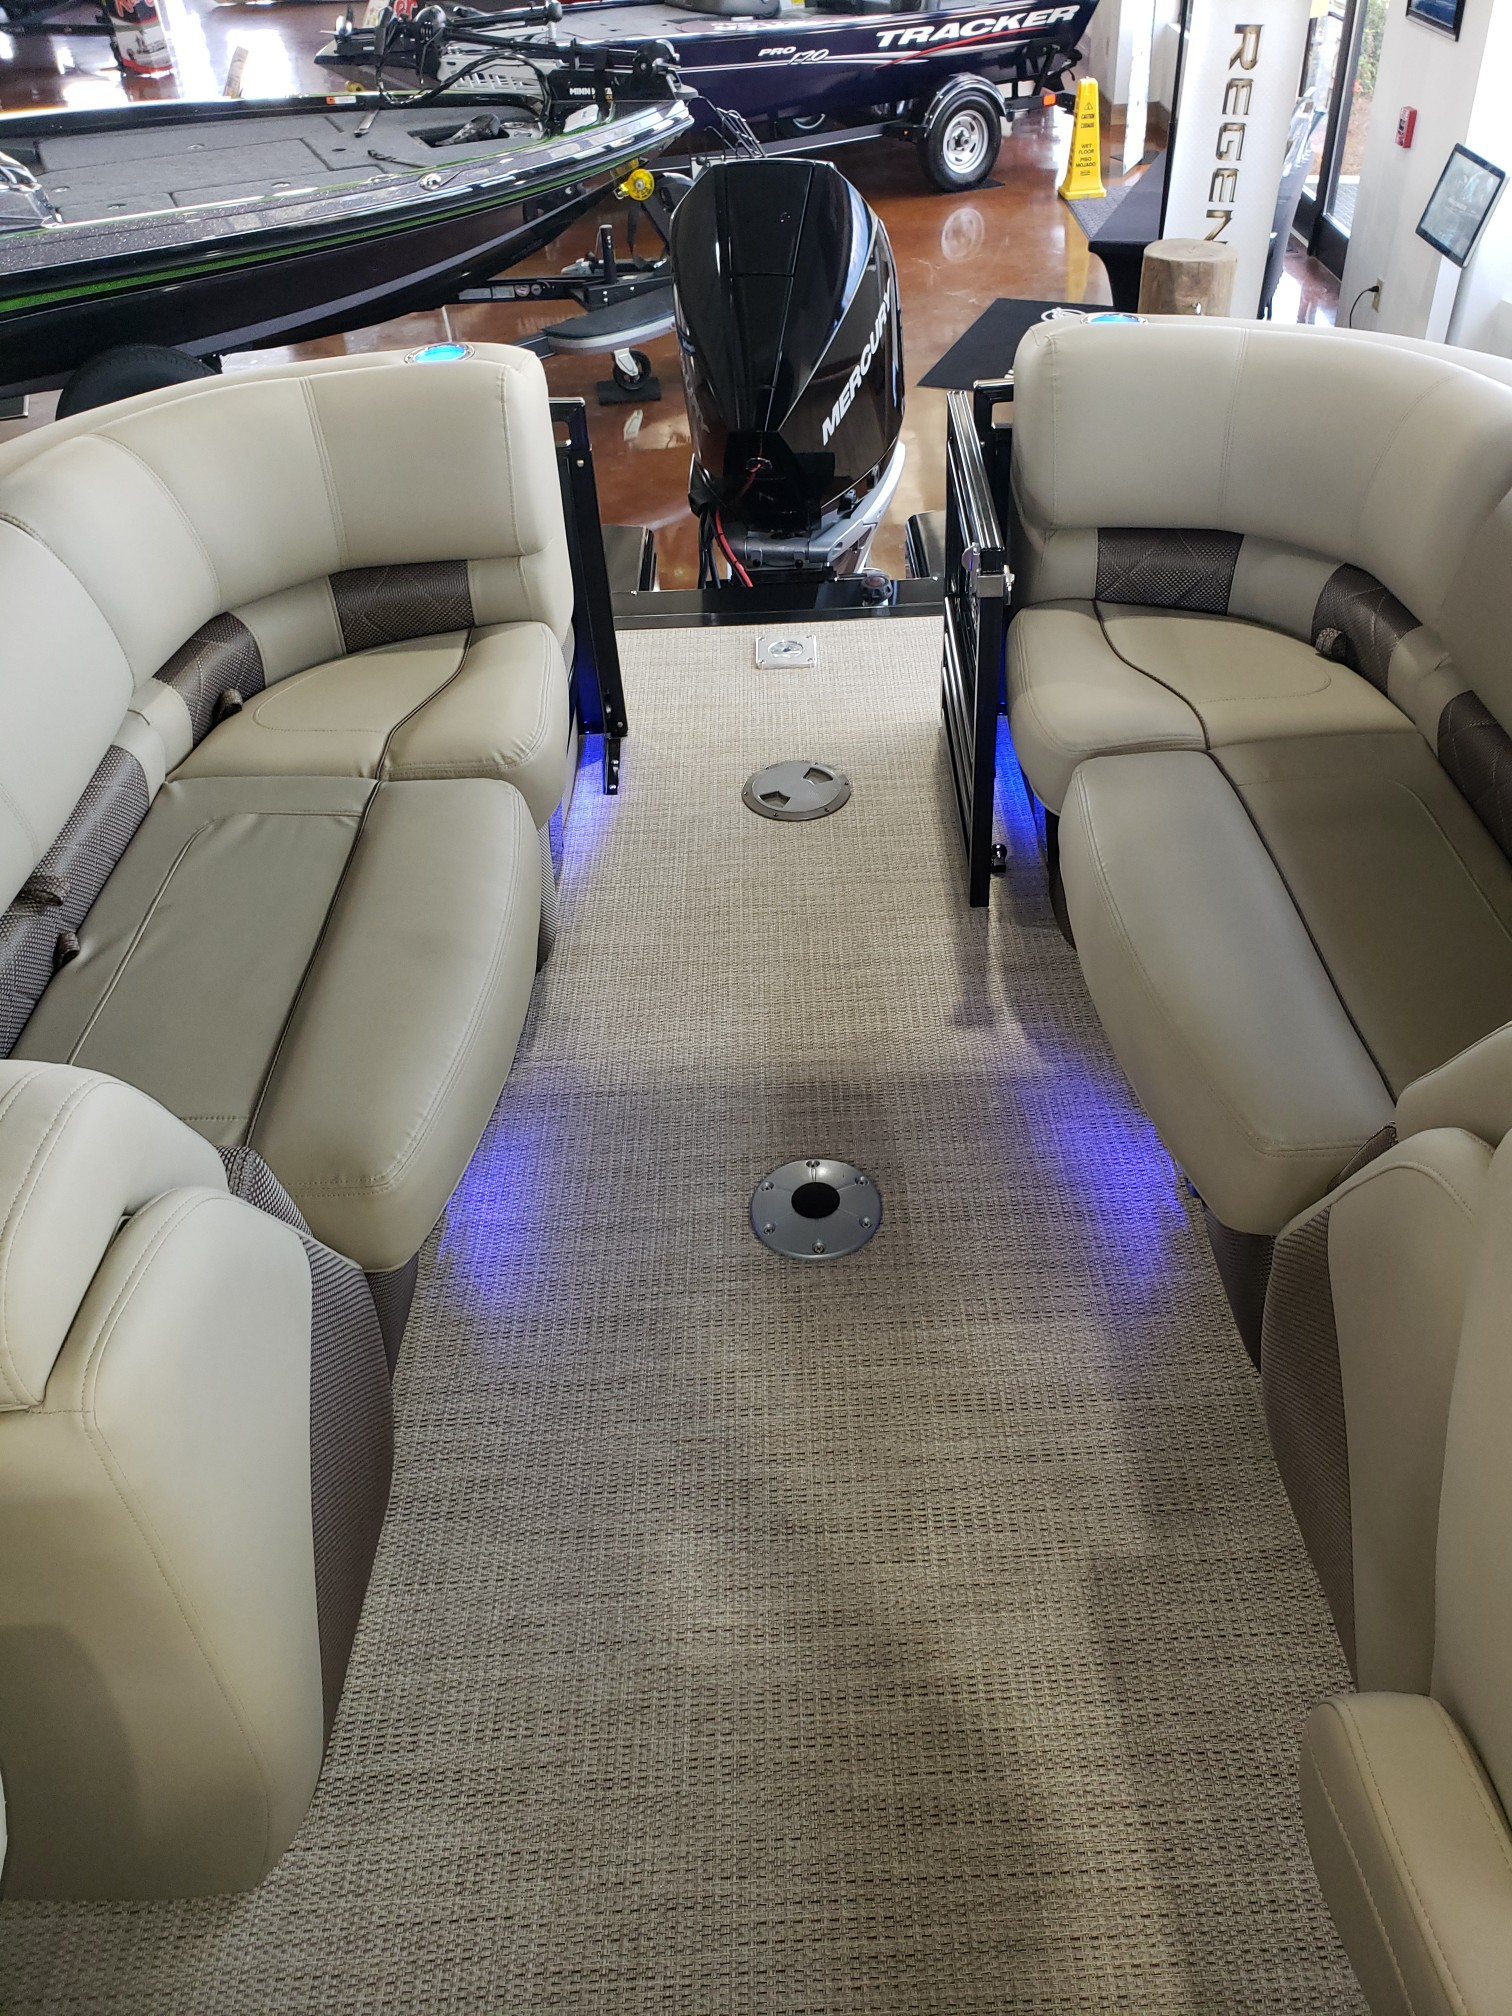 2020 Regency boat for sale, model of the boat is 250 LE3 w/300L Verado & Image # 6 of 27